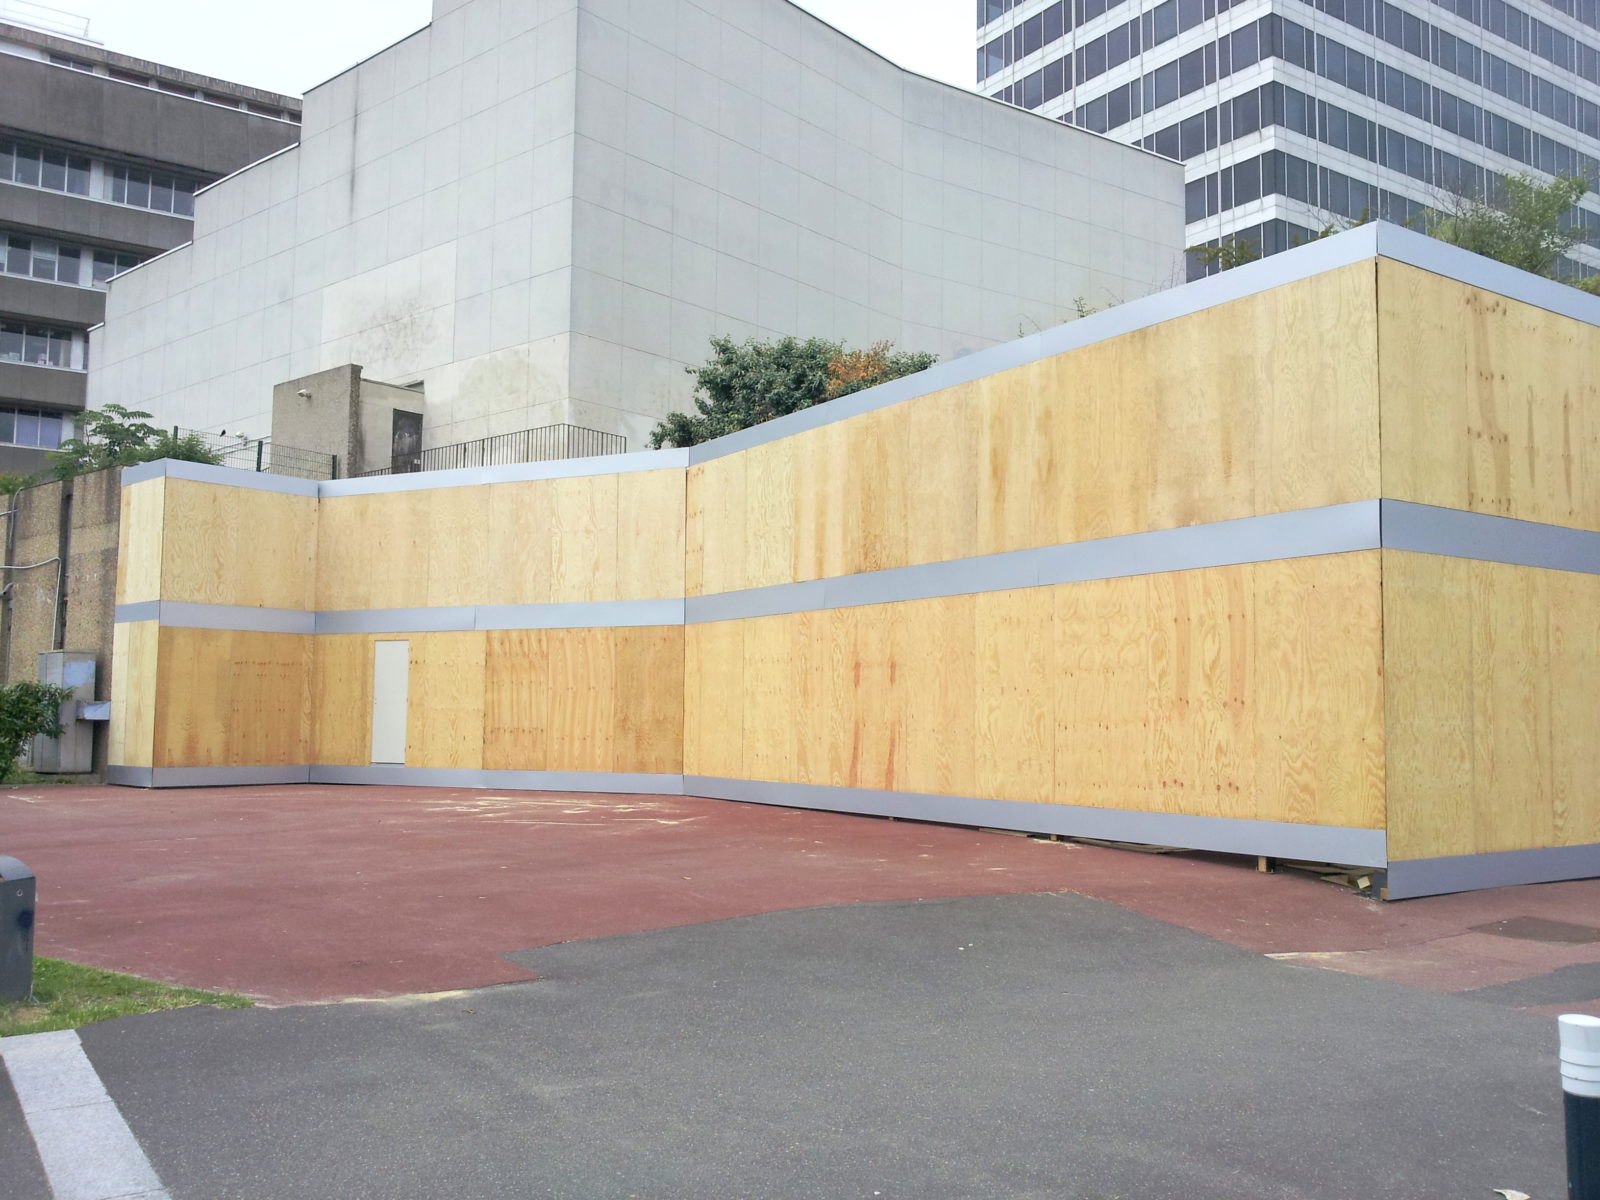 Habillage façade bois - Cinéma Cergy Pontoise